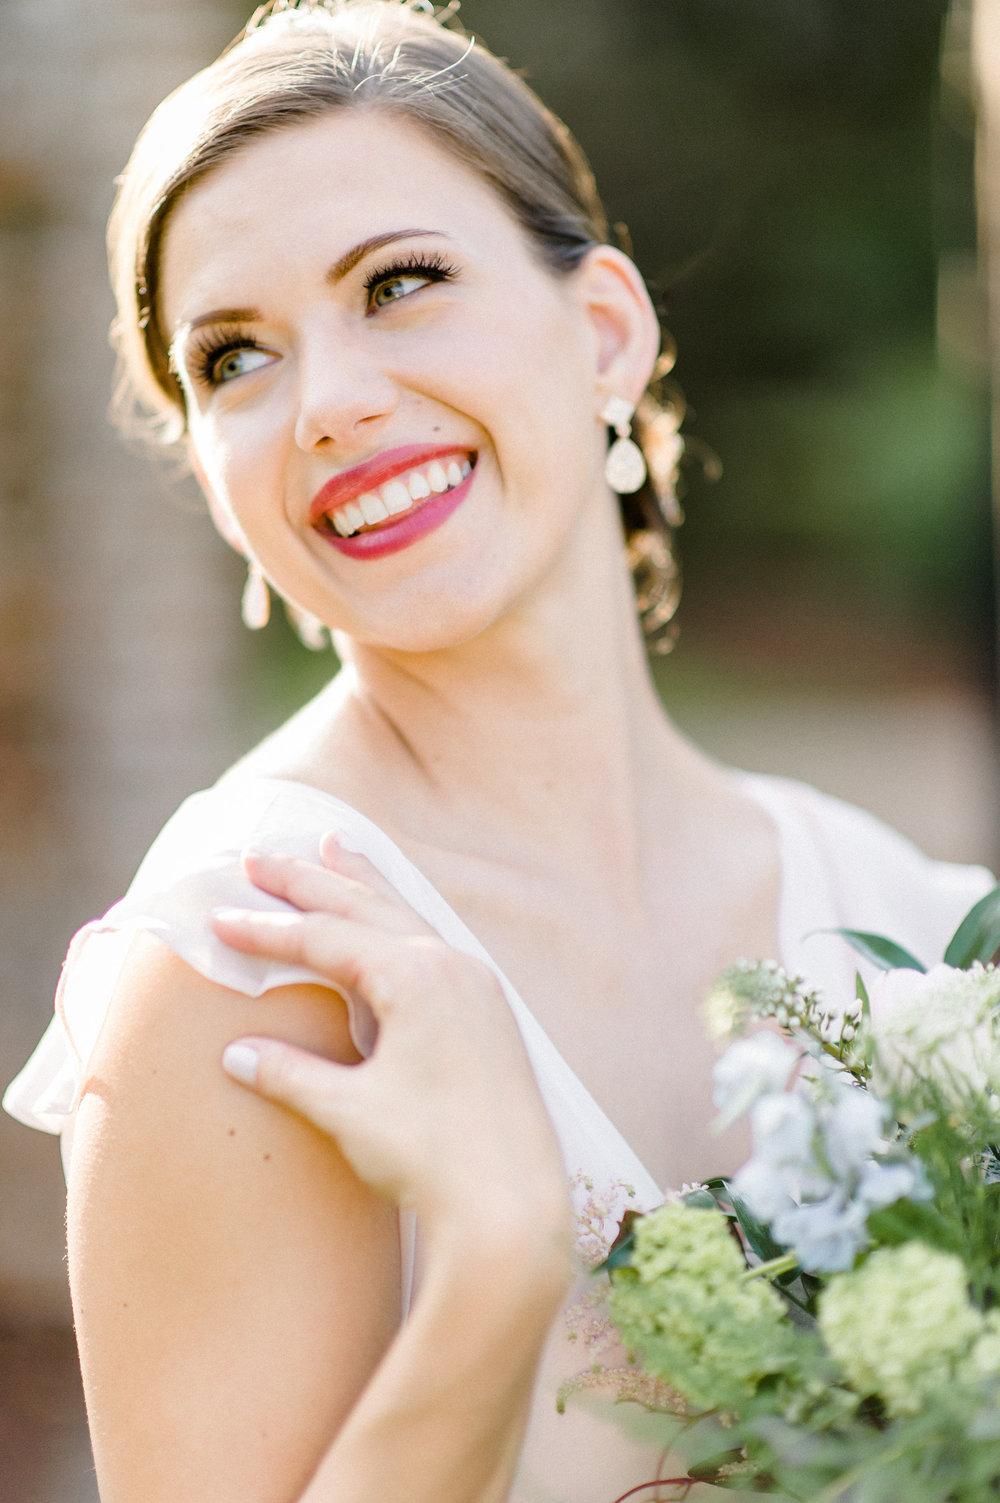 CarolineLimaPhotography_TheSutherland_Editorial_2016_209.jpg